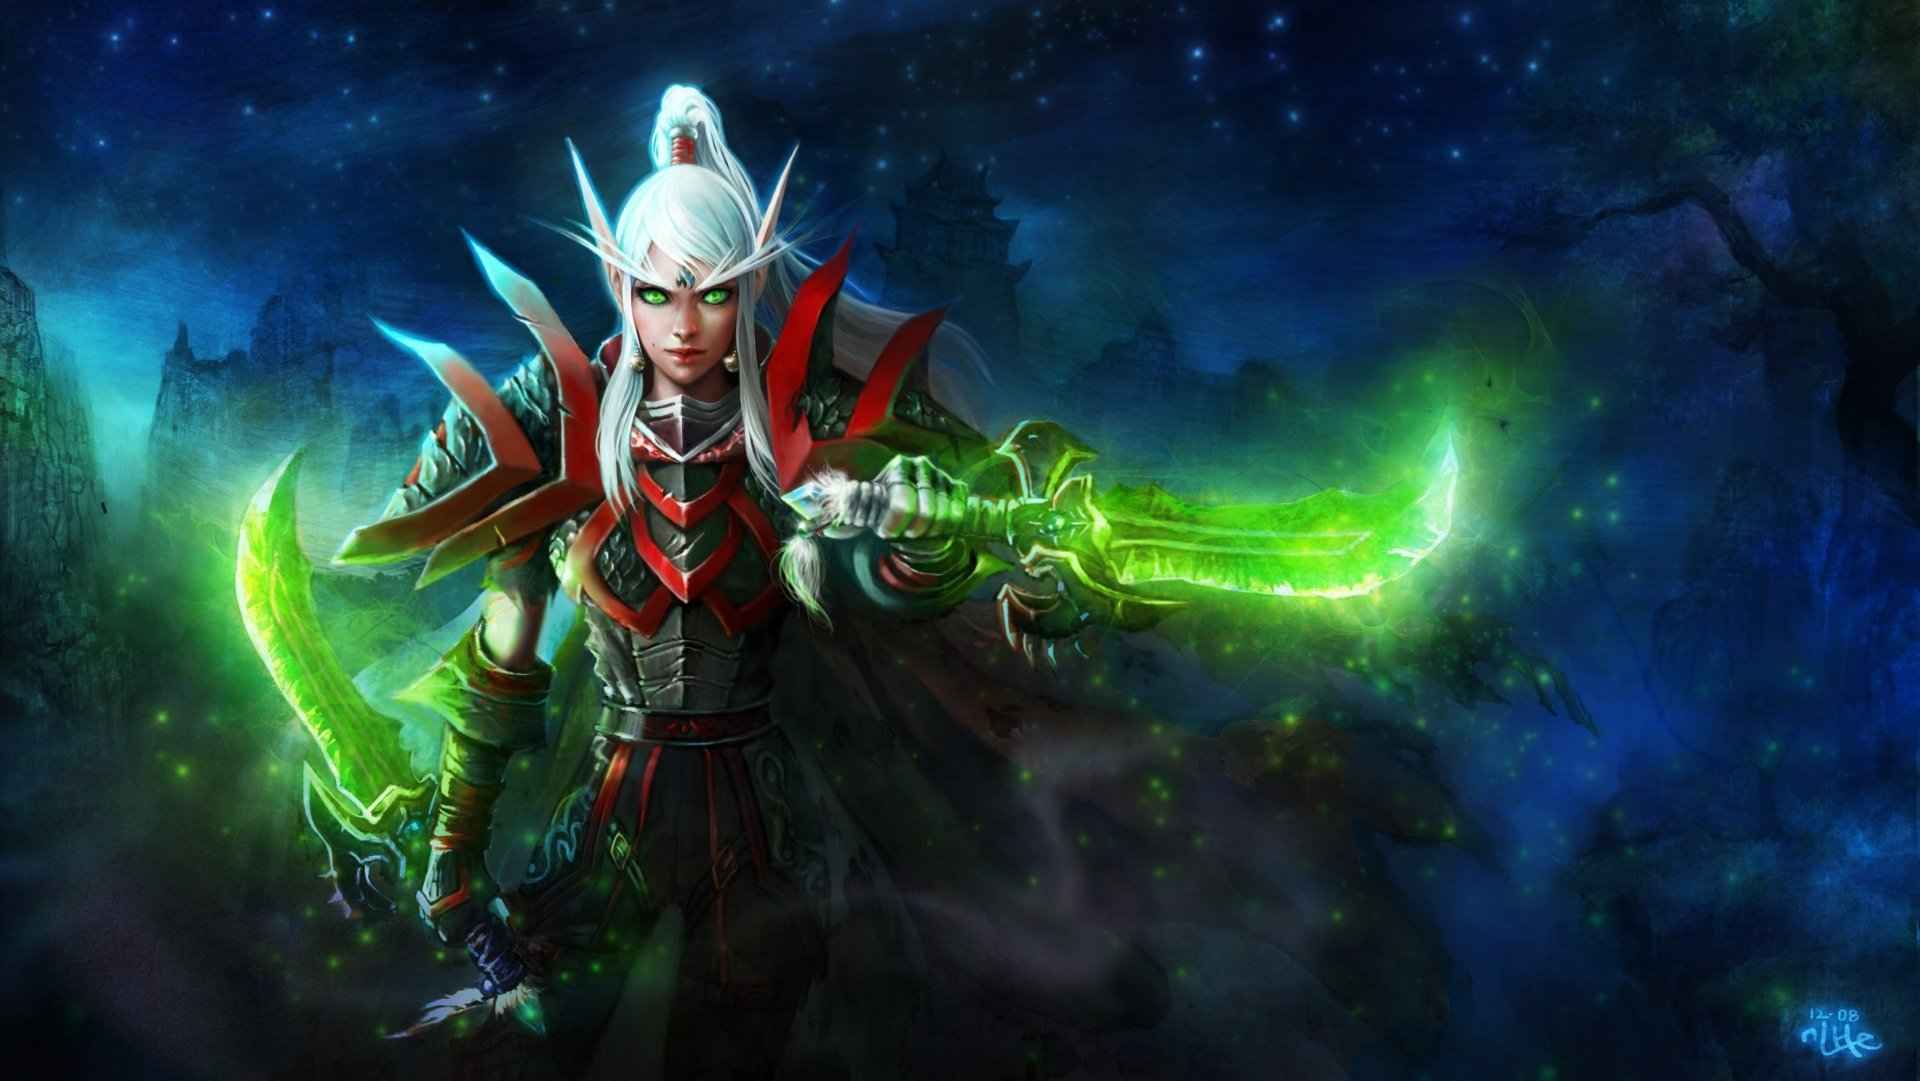 World Of Warcraft 4k Ultra HD Wallpaper | Background Image ...